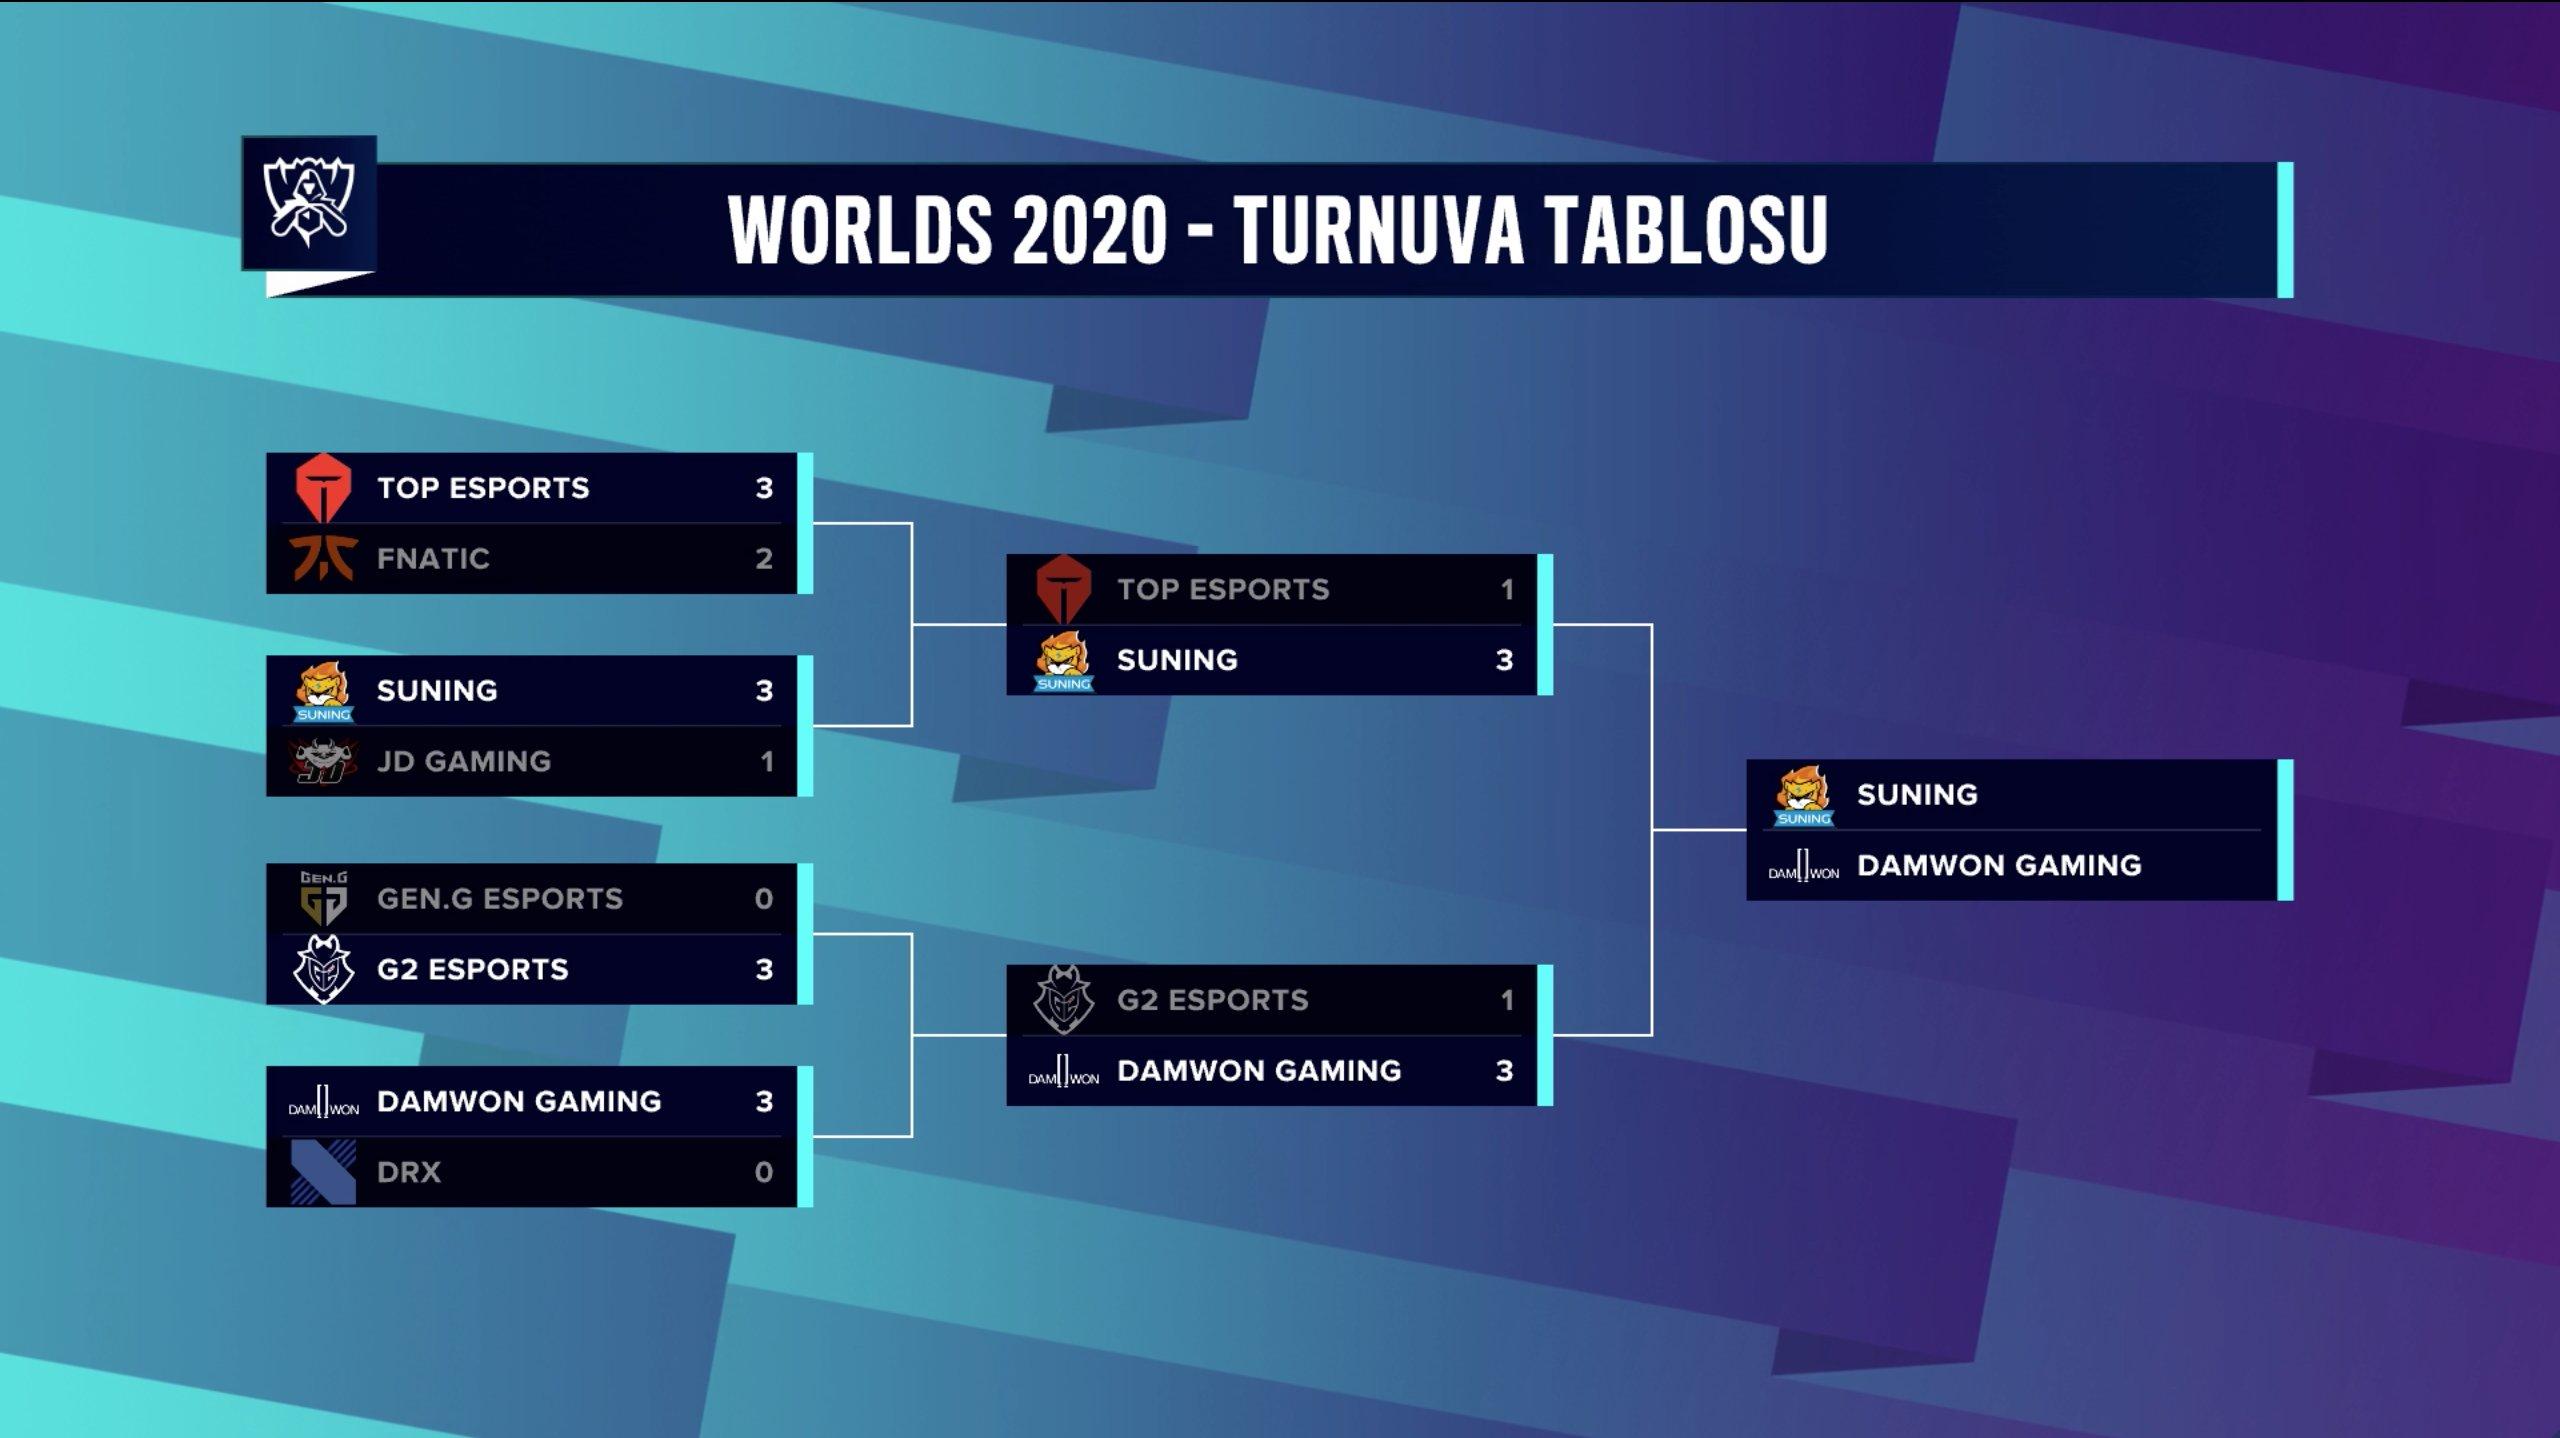 worlds-2020-finali-yaklasiyor